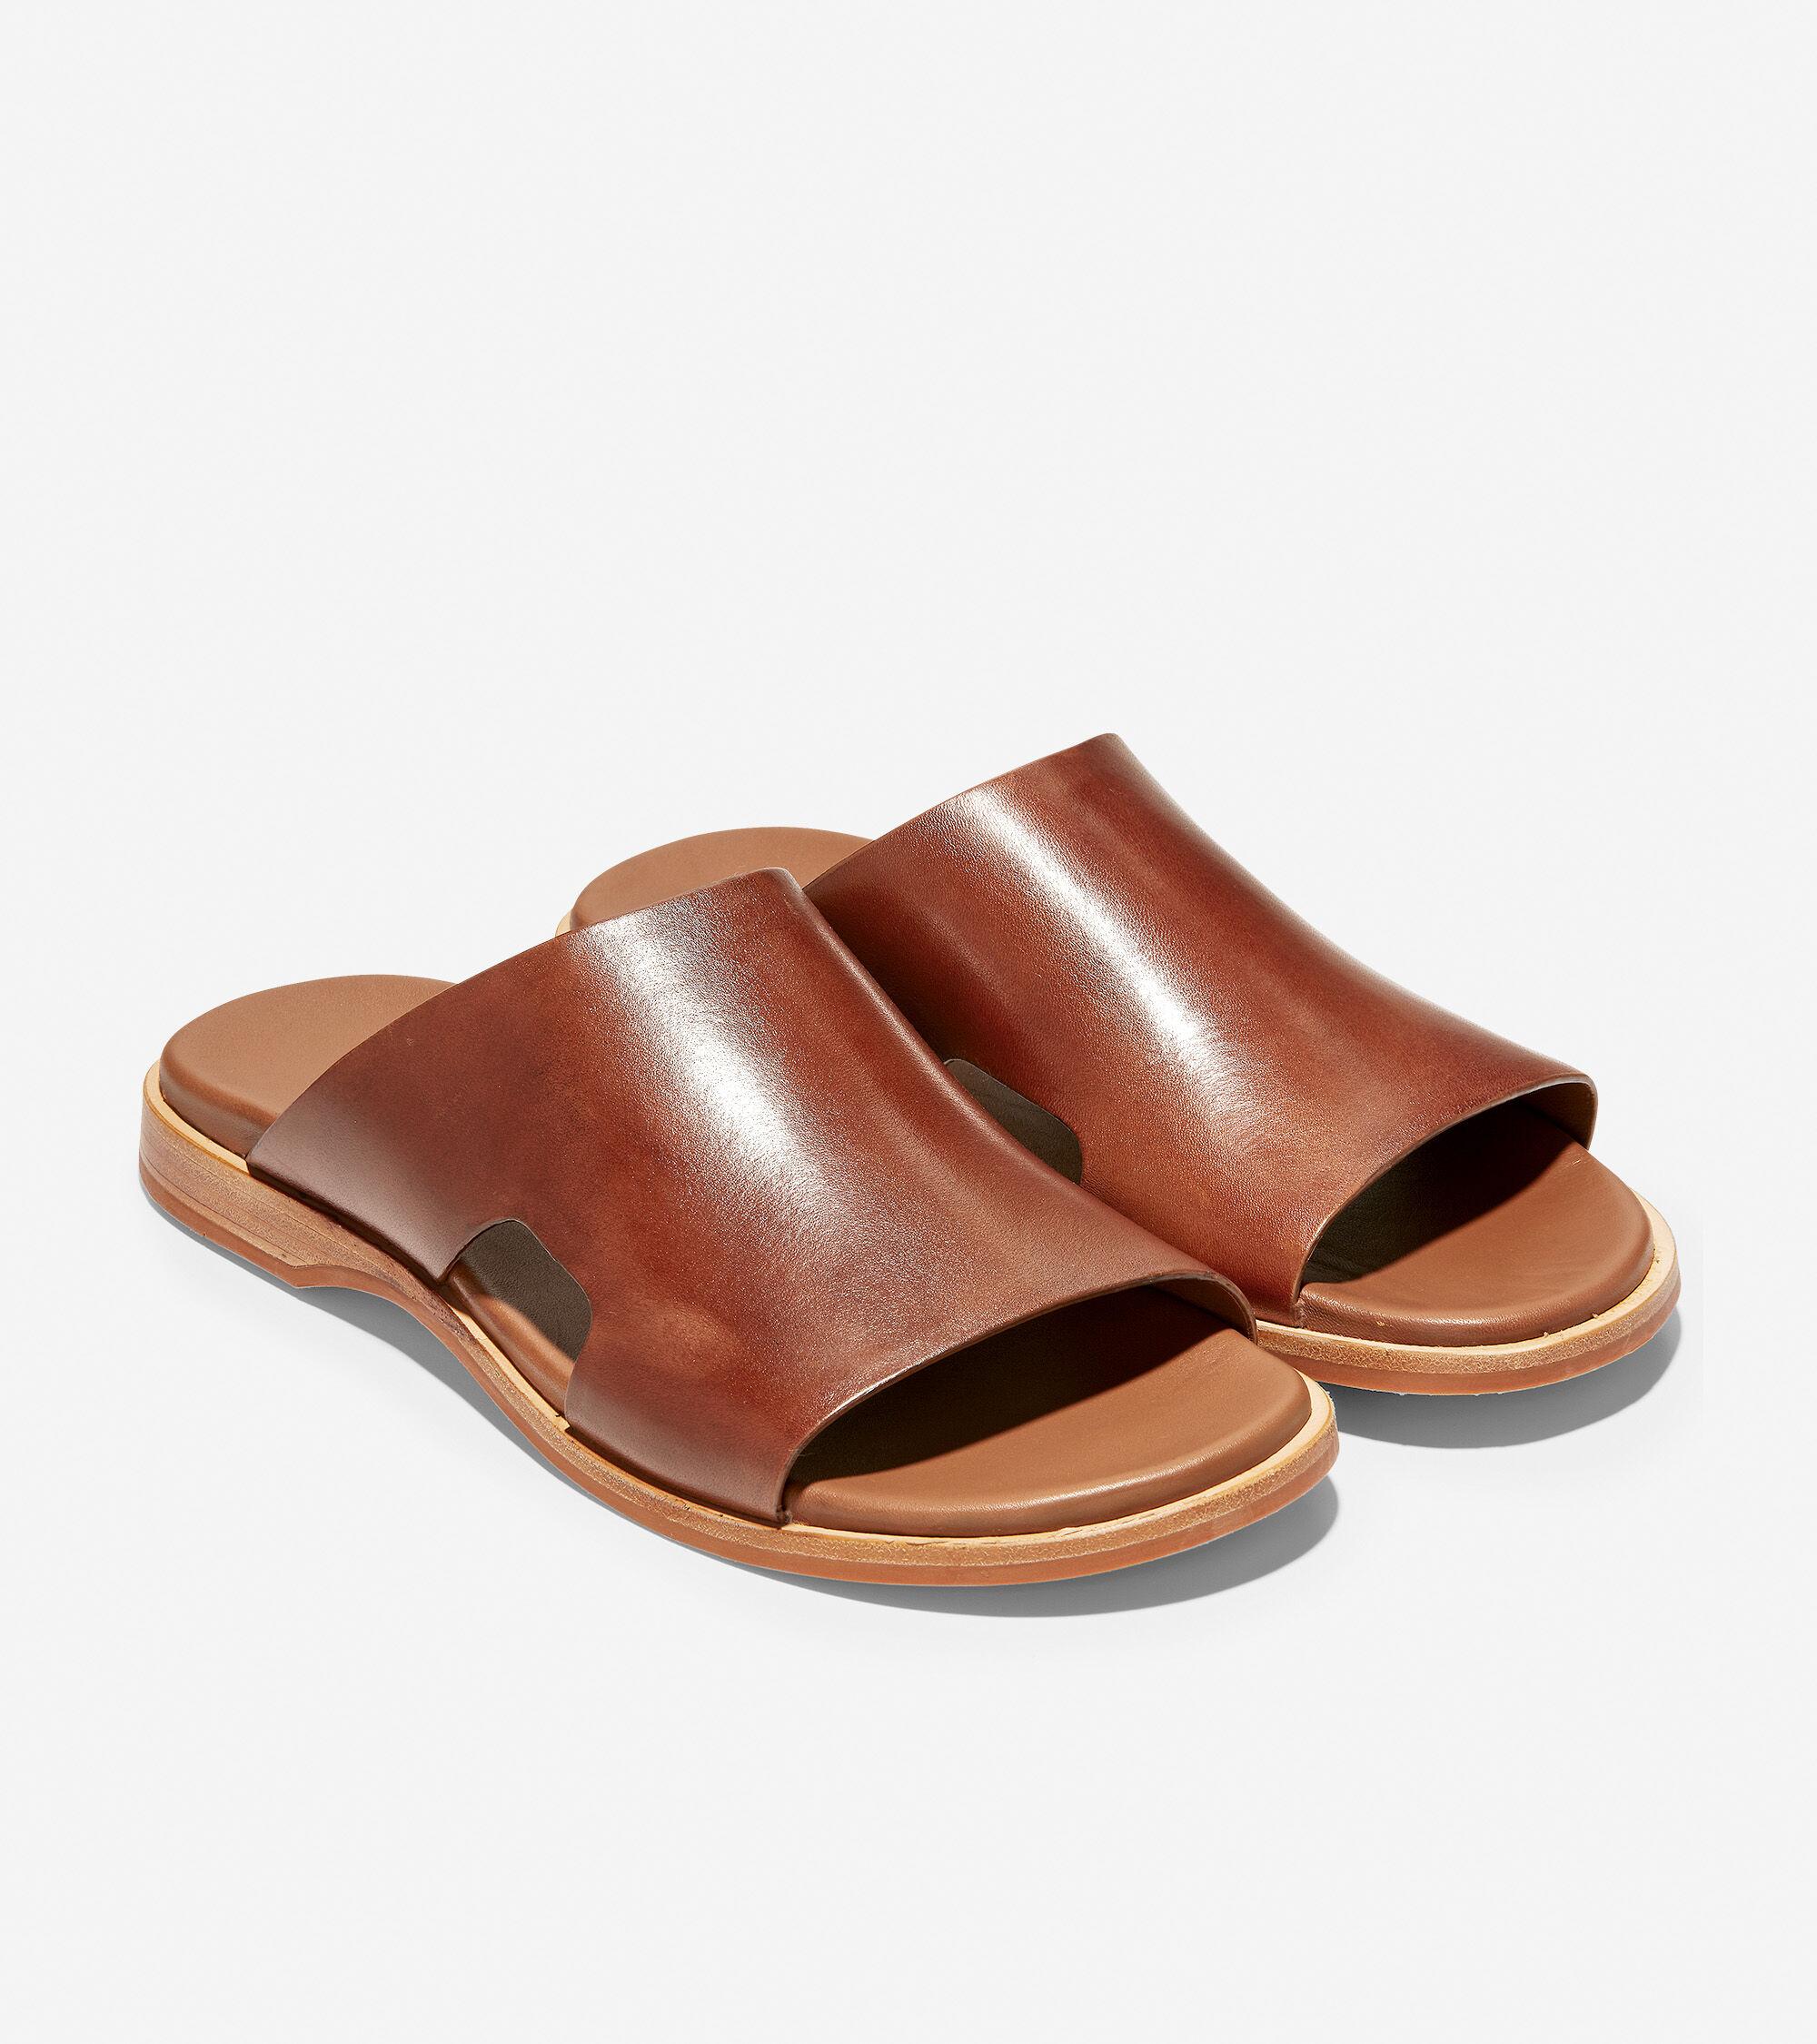 Men's Goldwyn Slide Sandal in British